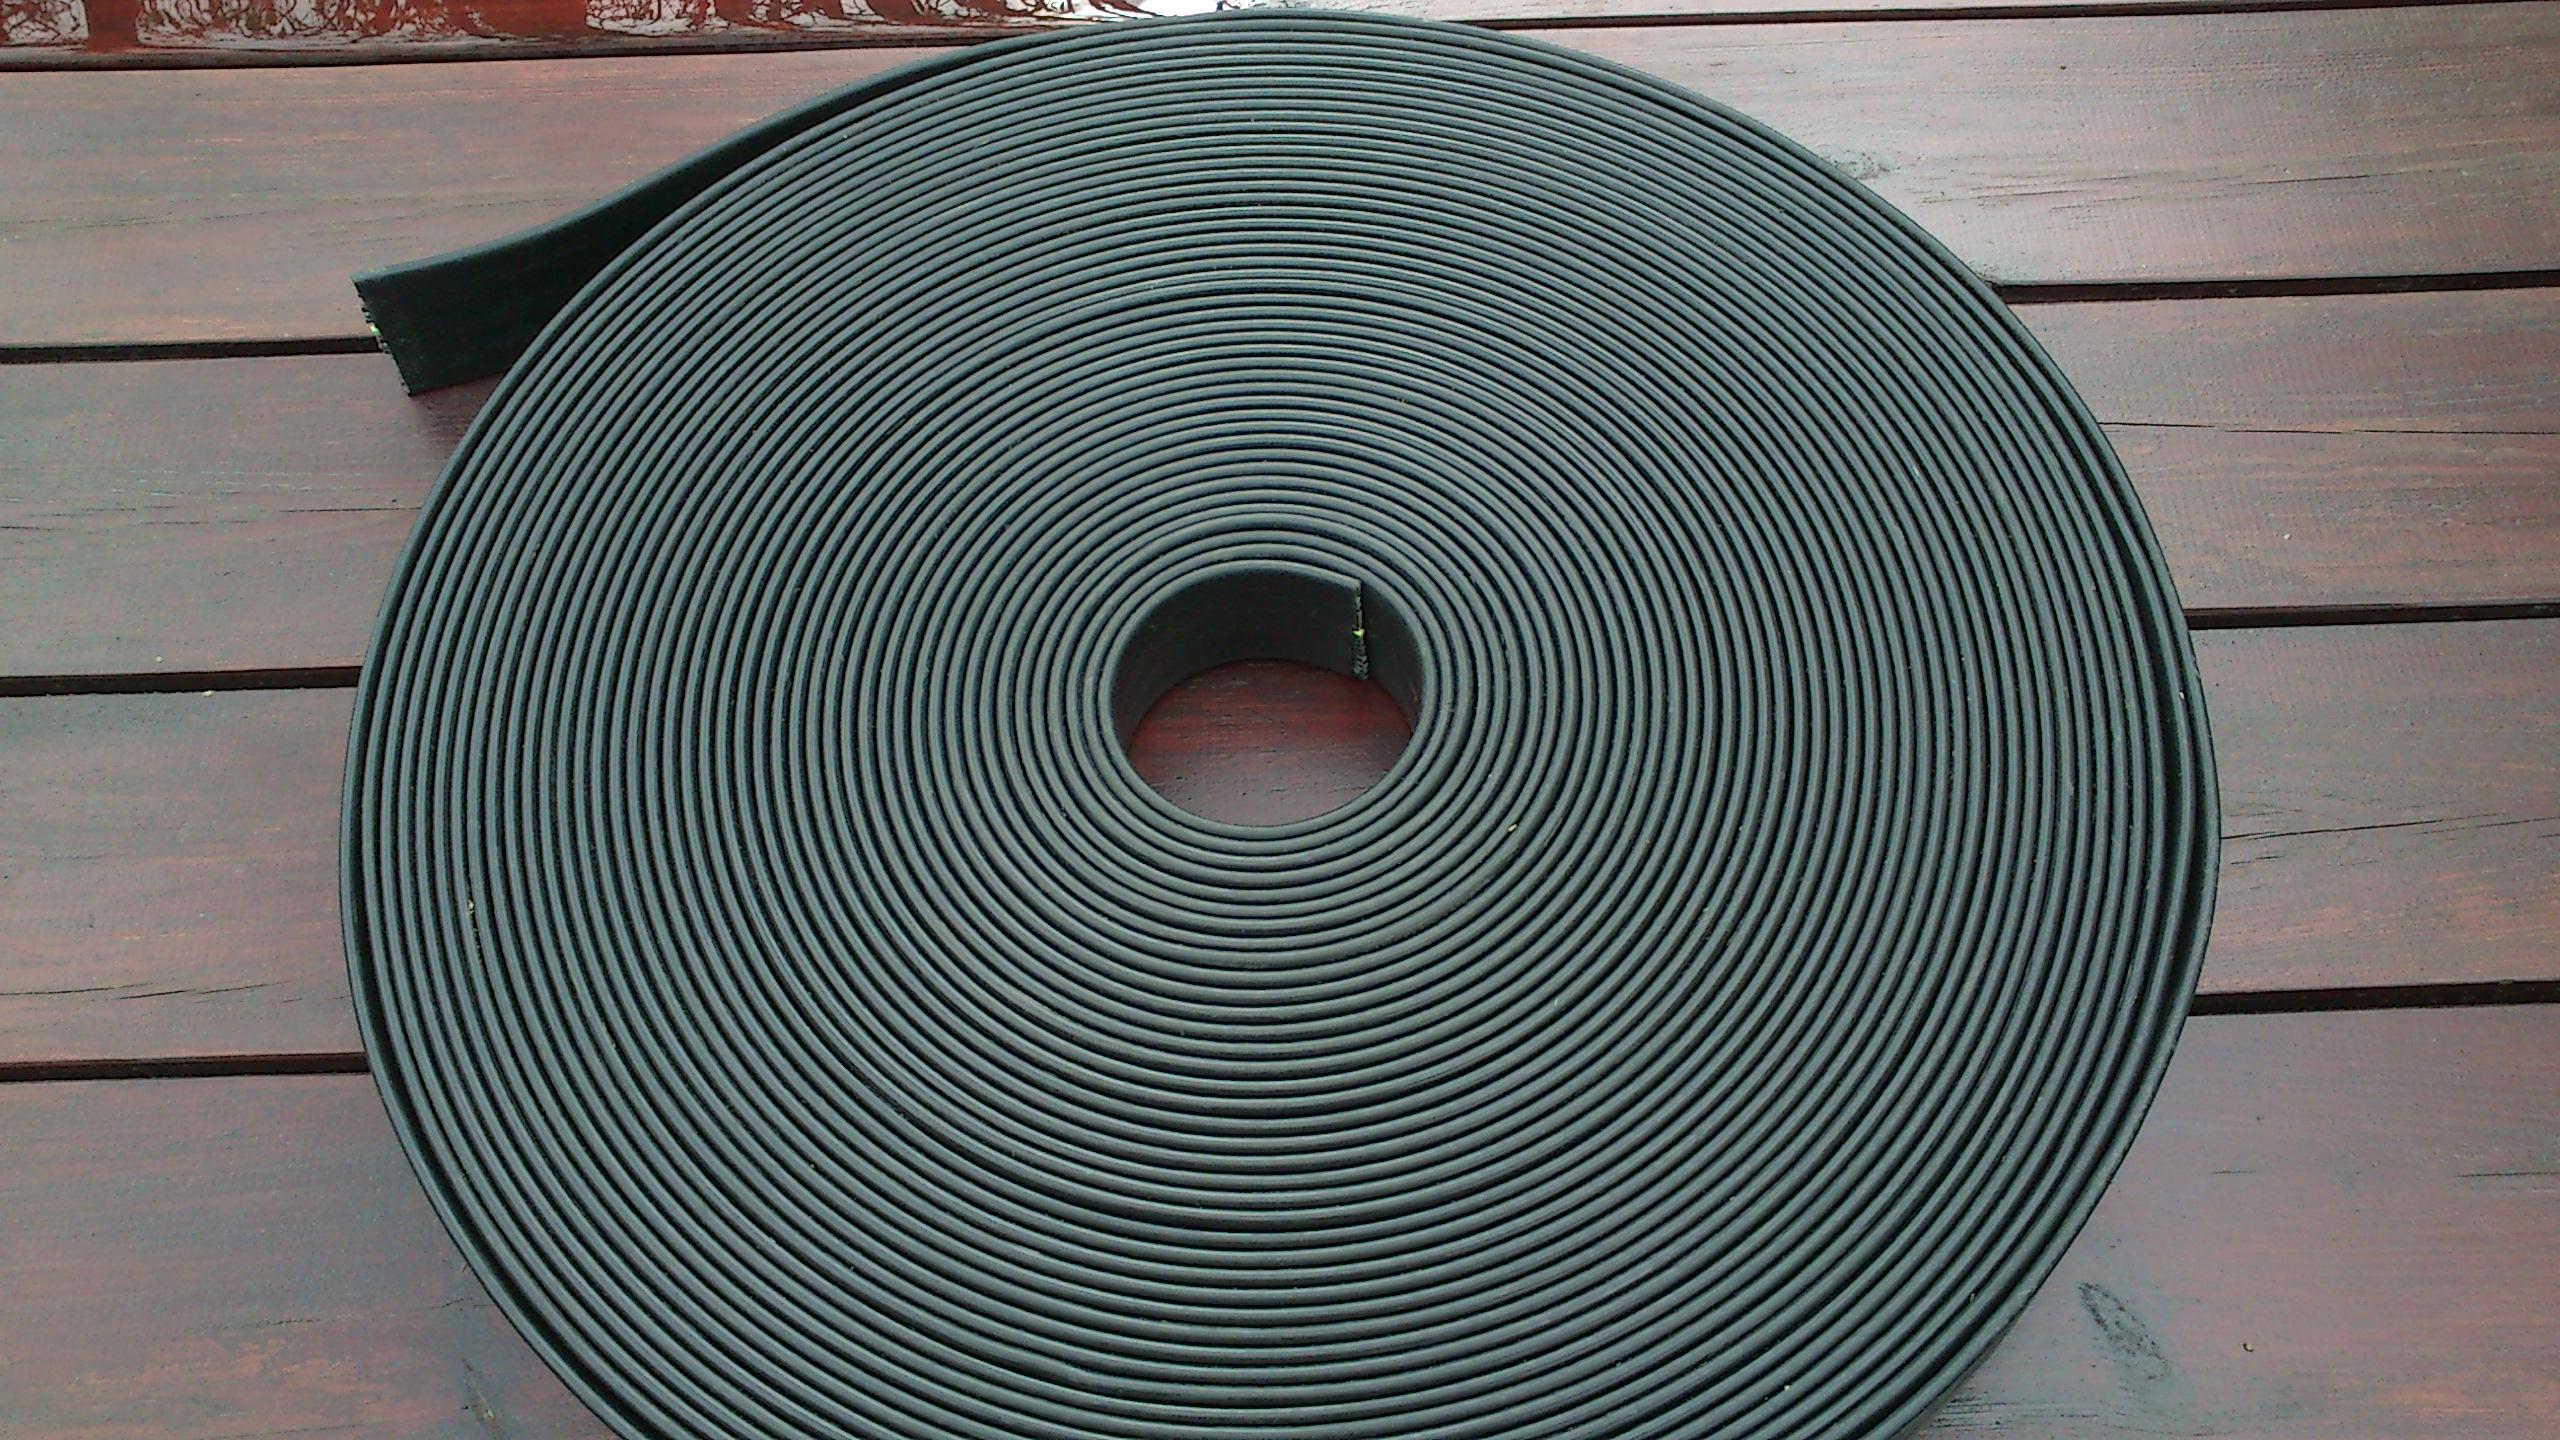 [Sprzedam] Kabel wielo�y�owy p�aski LIFT-KABEL NEXANS CH H05VVH6-F 18G1.00MM2